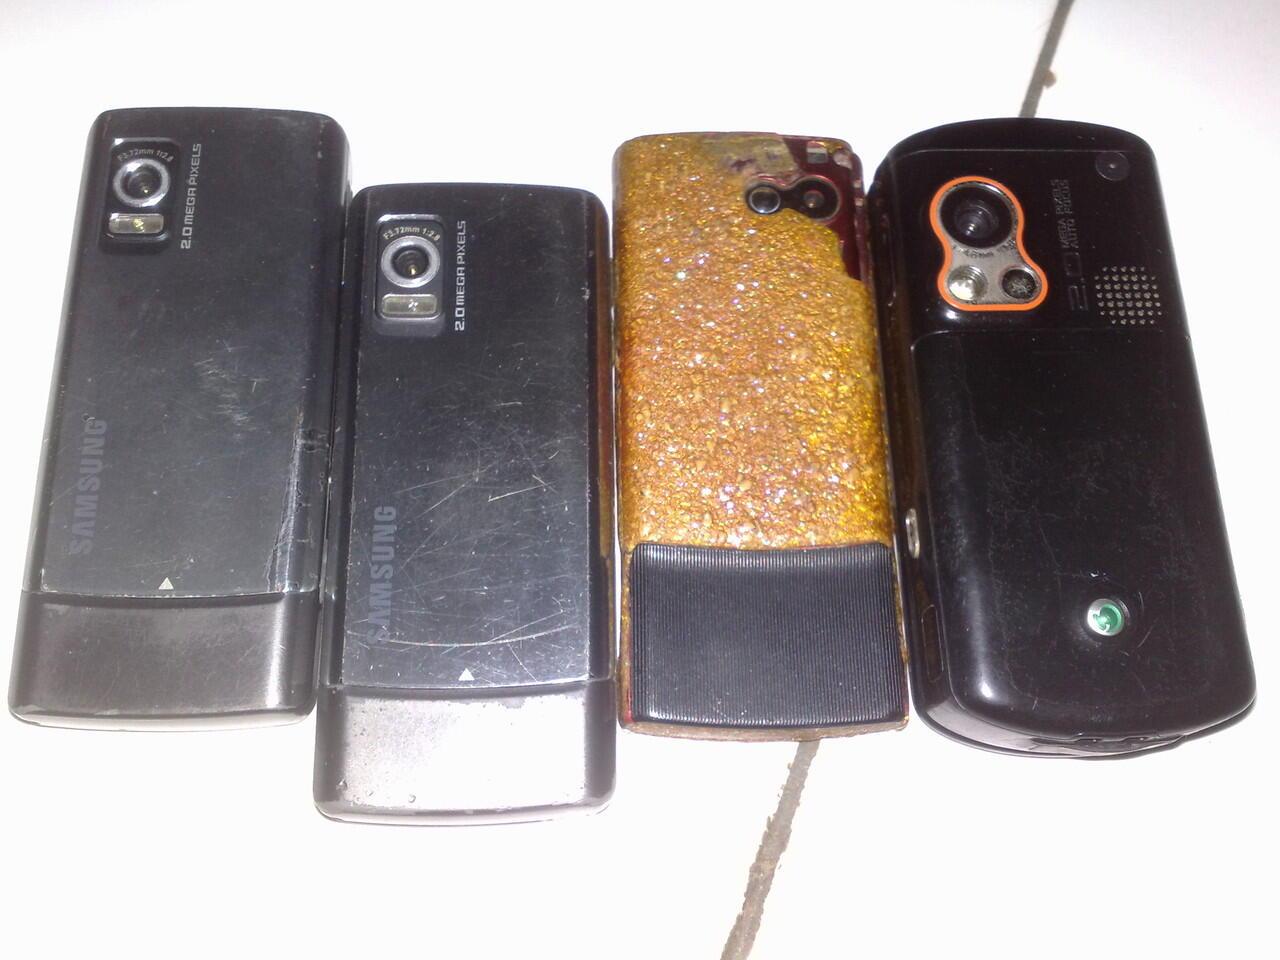 Nokia 7610, Sony Ericsson / Soner W900, 2 Samsung L700 apa adanya